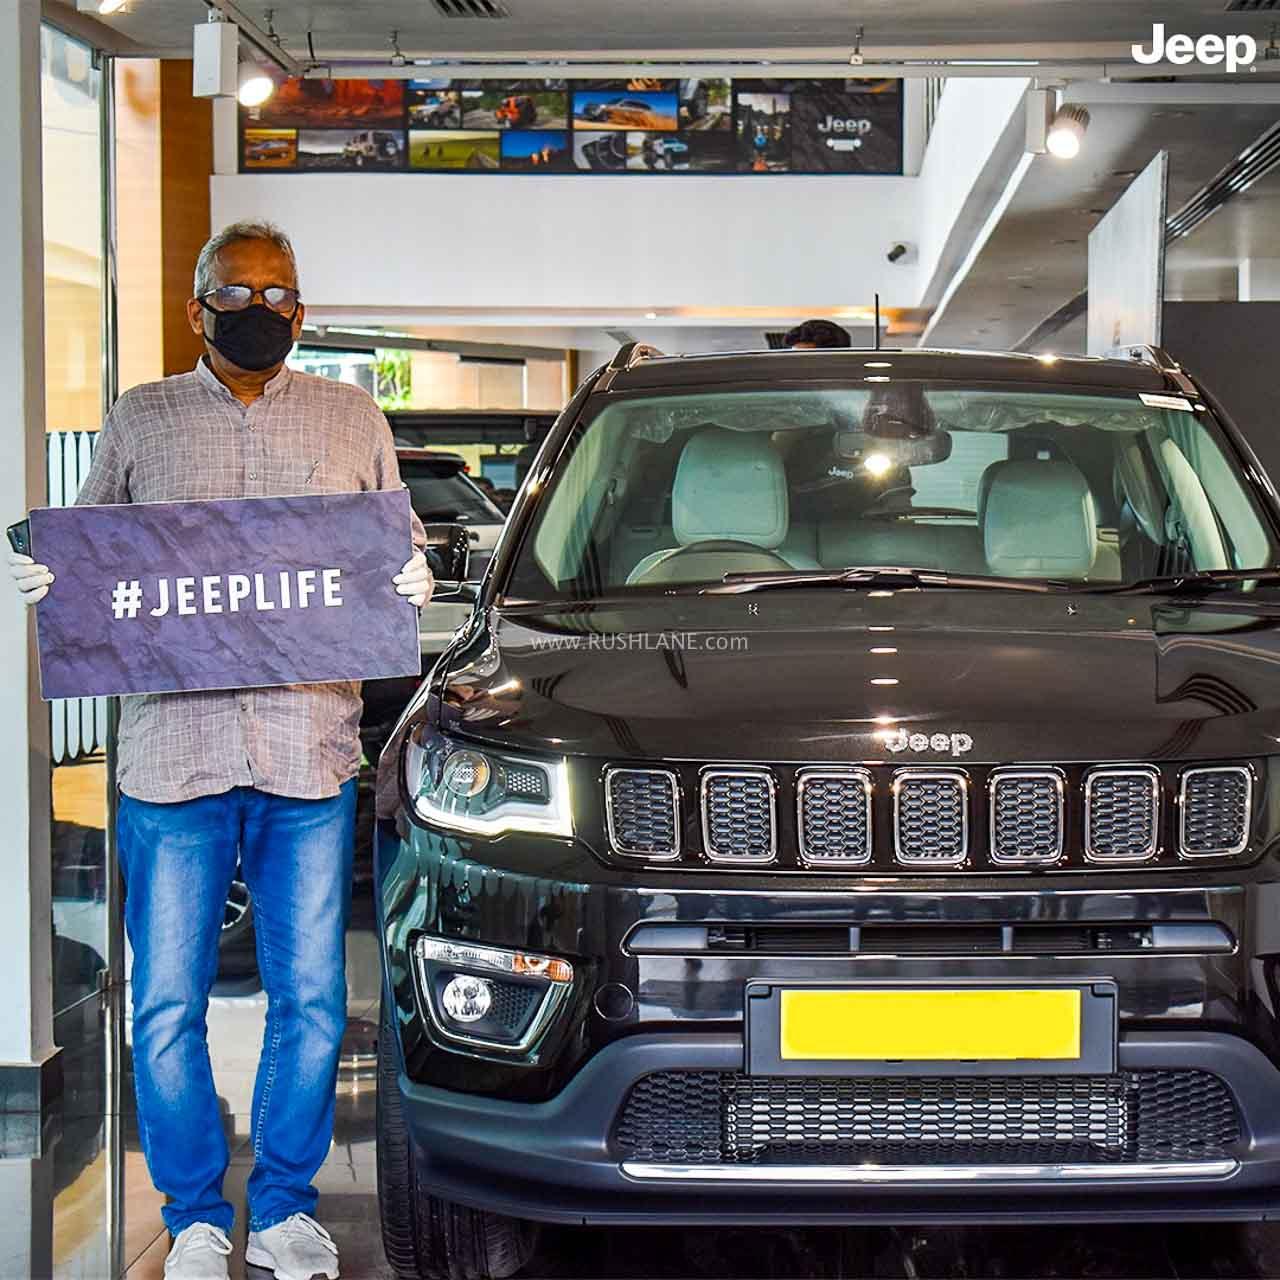 Jeep Compass deliveries restart